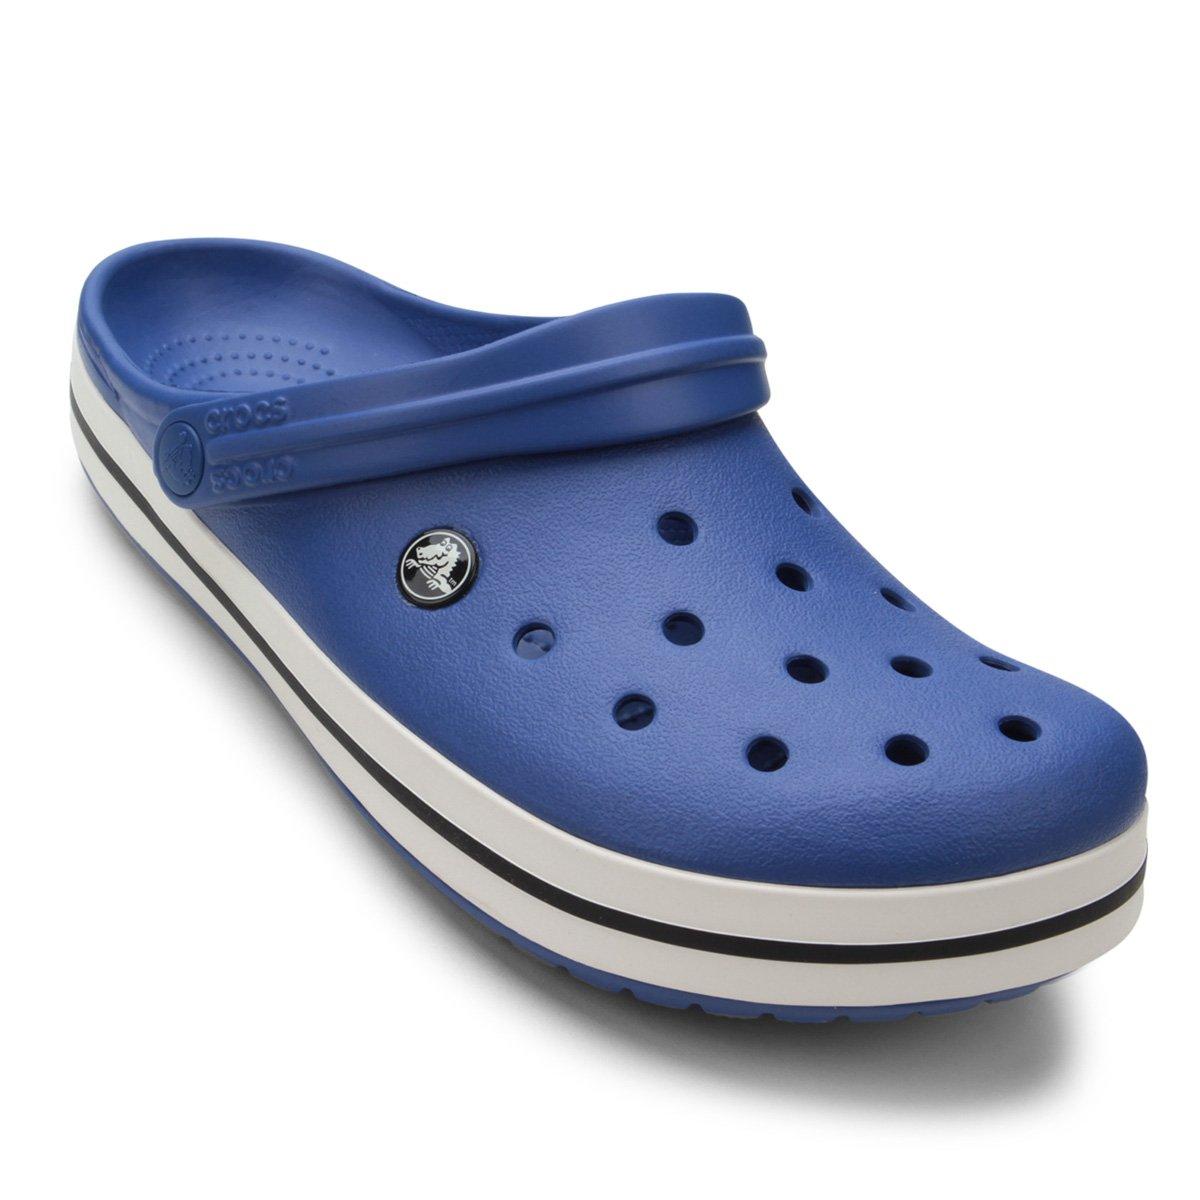 a82ffea0af7 Sandália Crocs Crocband - Azul Claro - Compre Agora